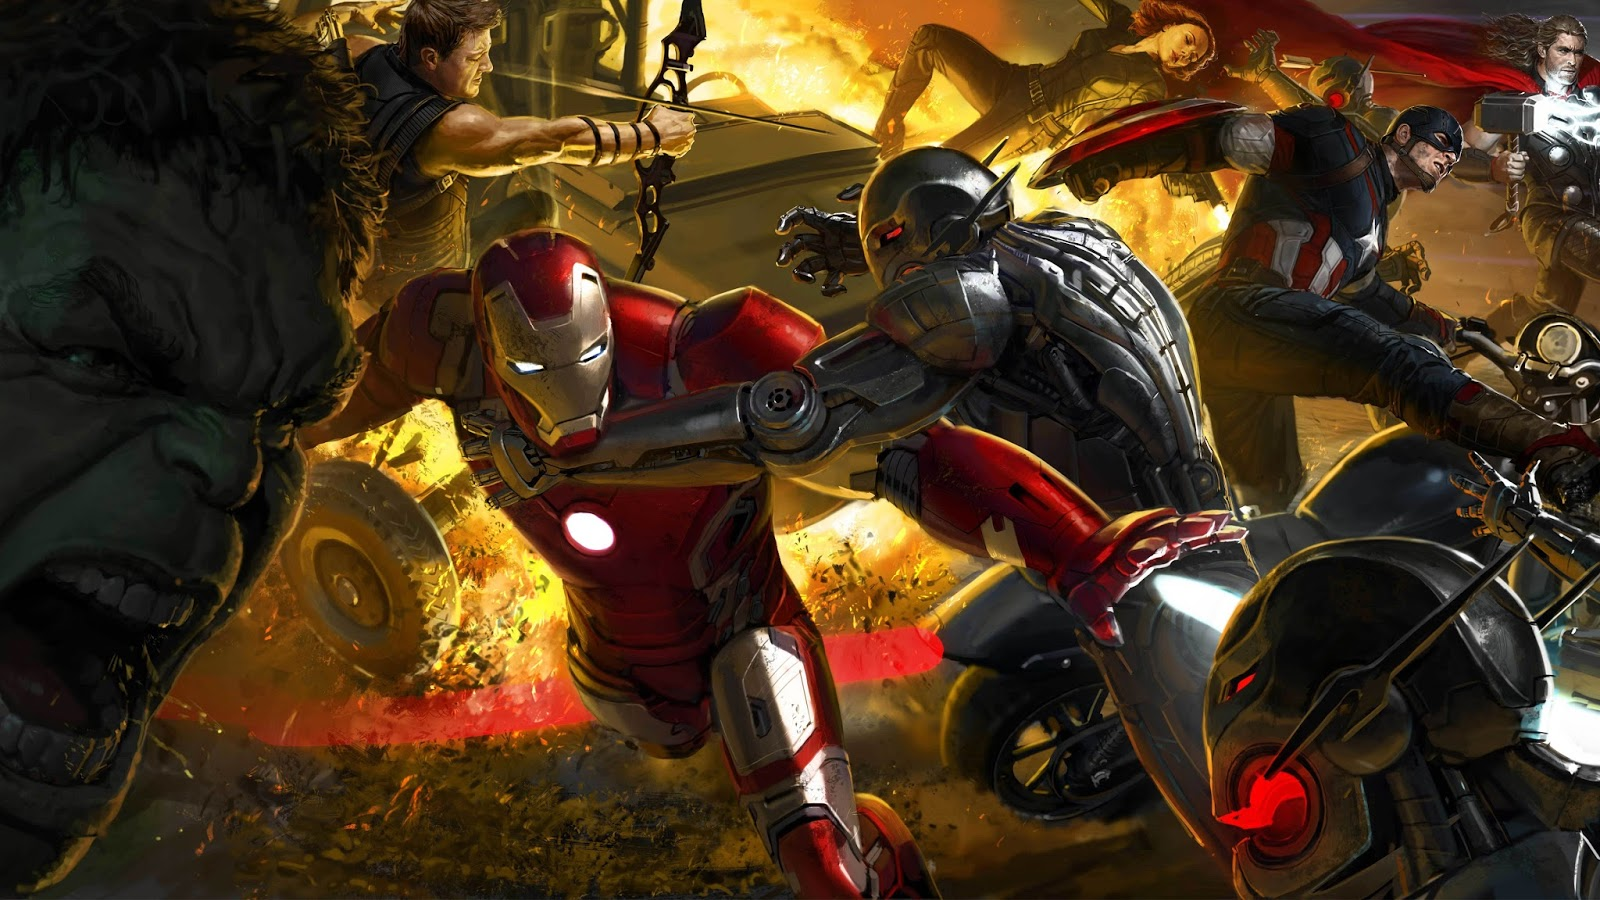 Avengers Infinity War Wallpapers - Avengers Infinity War Concept